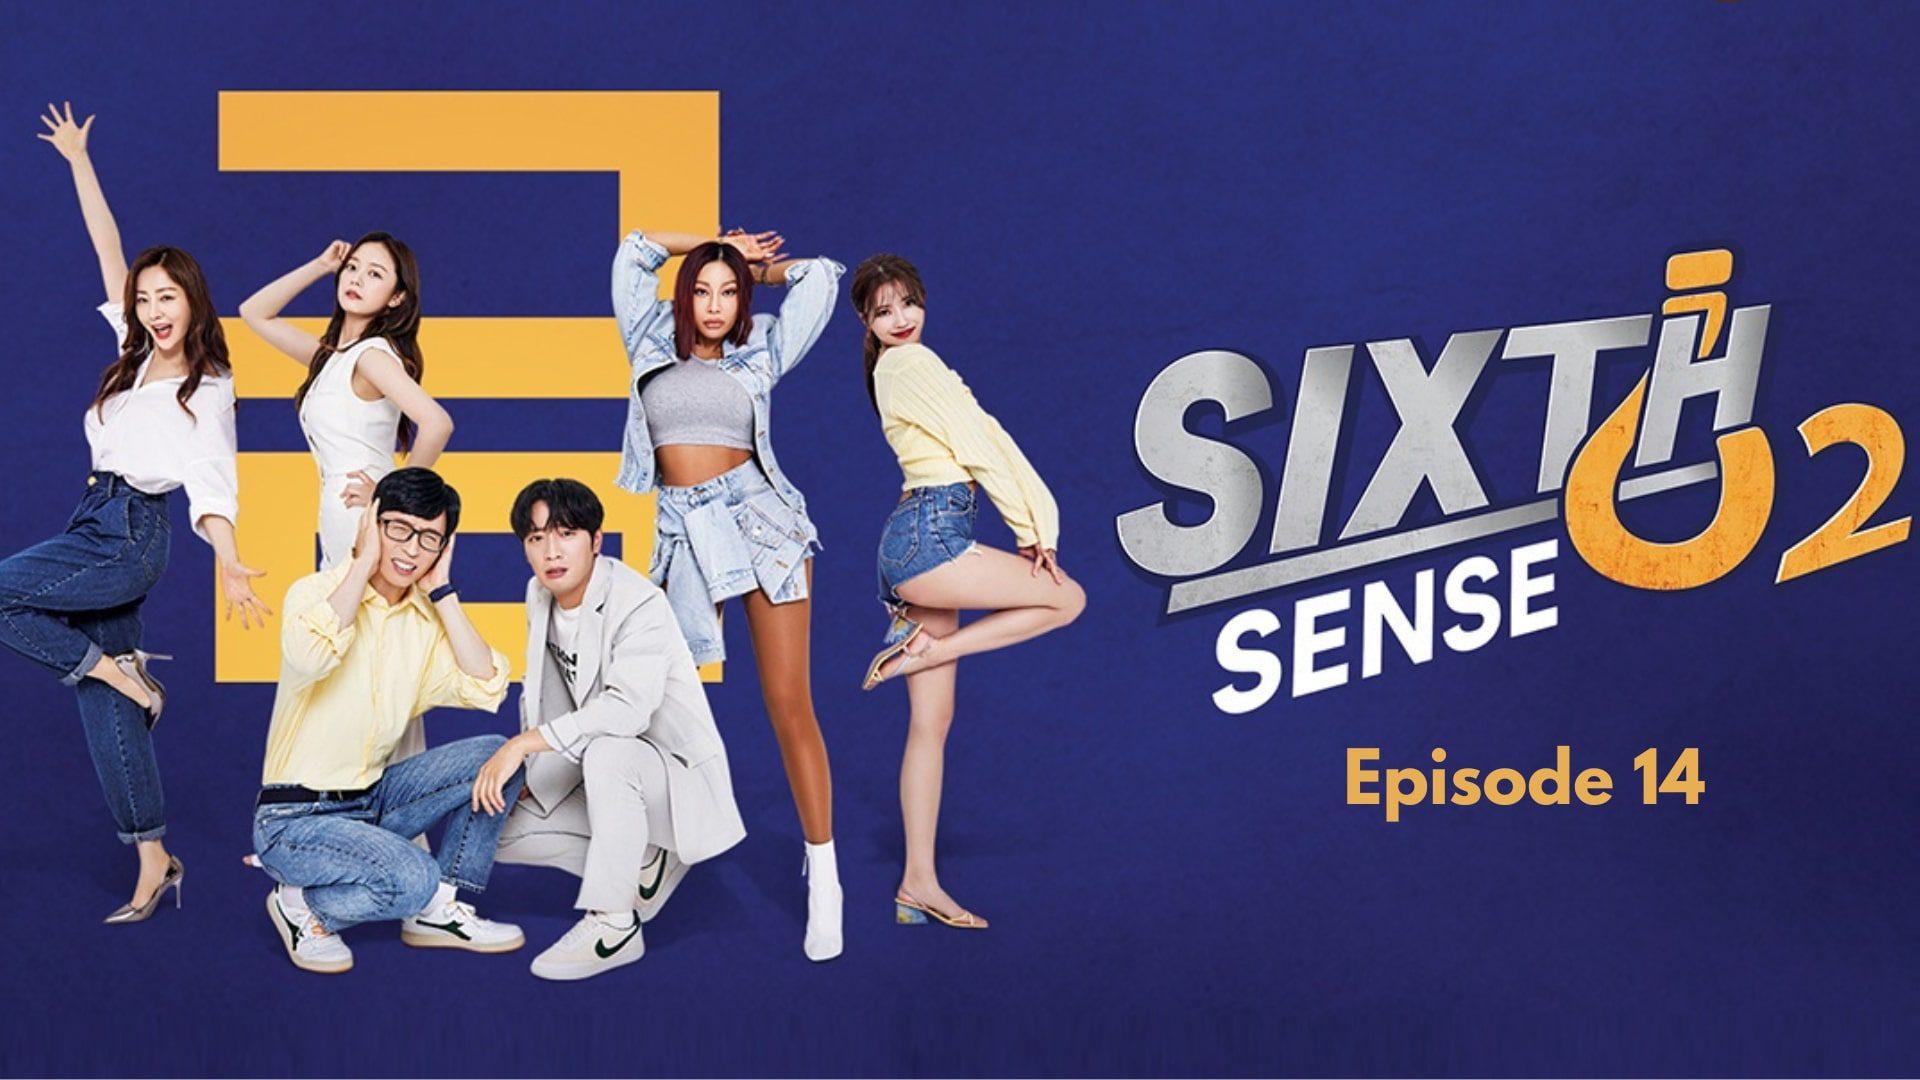 Sixth Sense Season 2 Episode 14